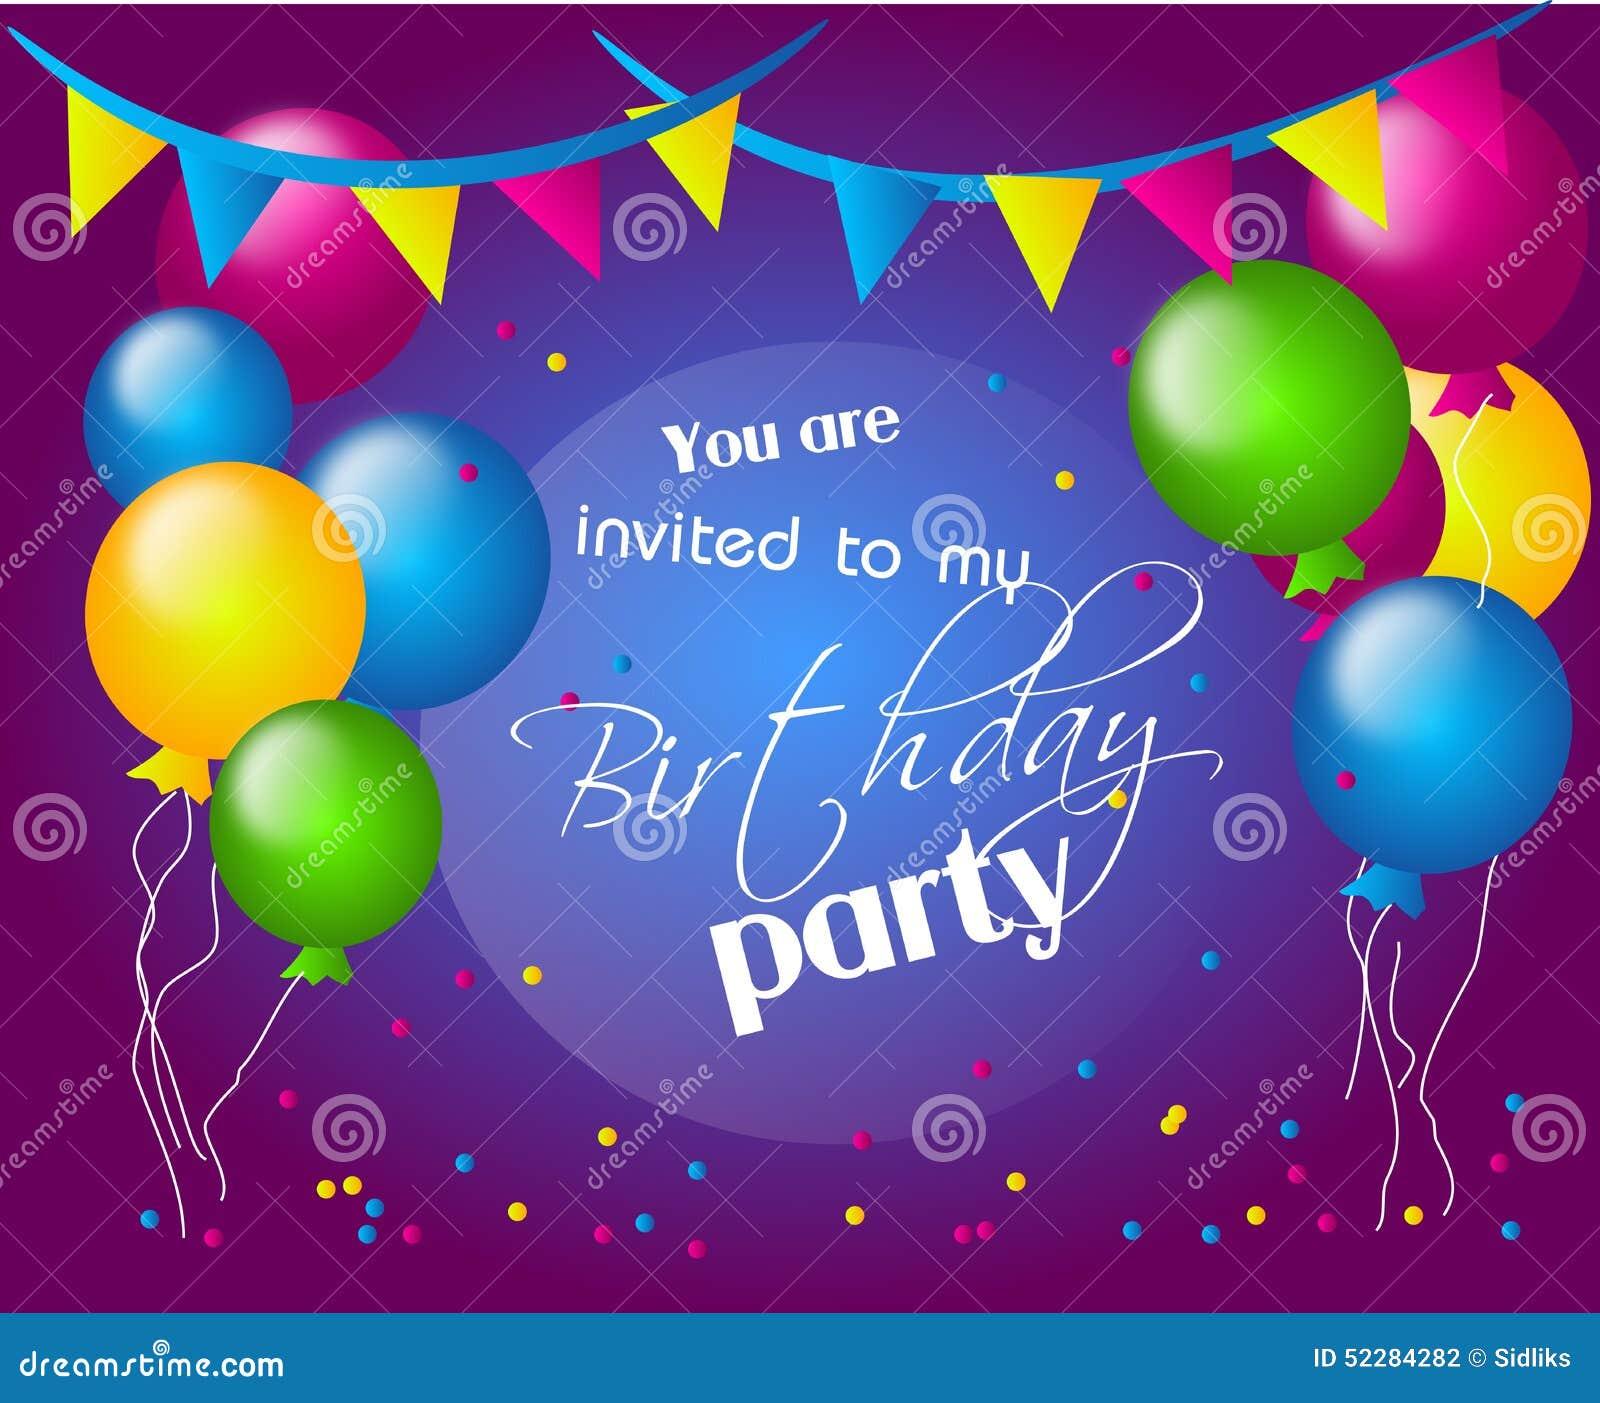 einladung an geburtstagsfeier stock abbildung - bild: 52284282, Einladung